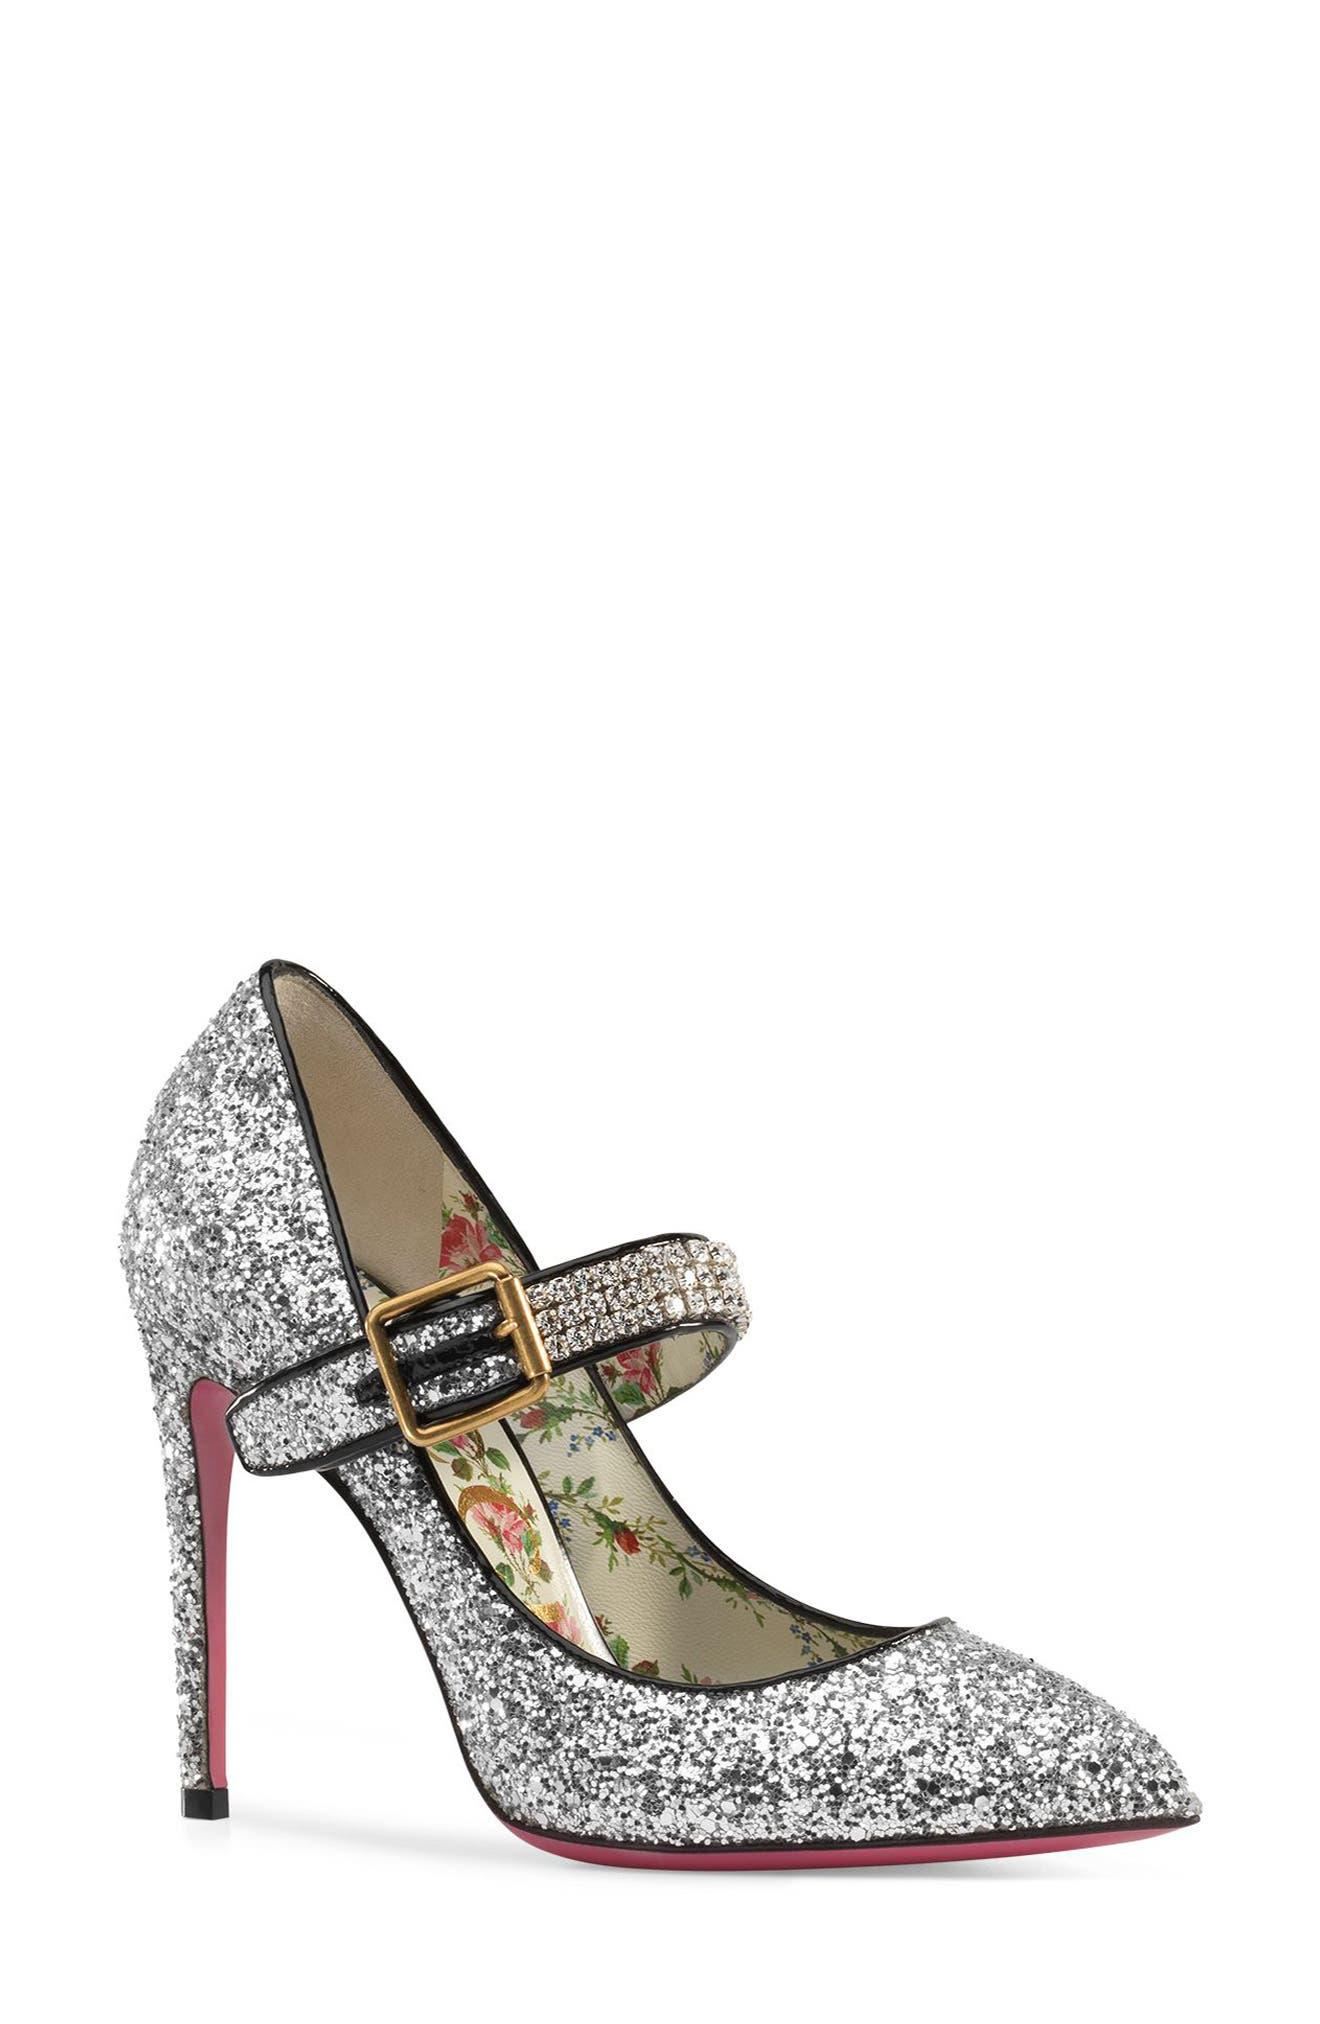 Sylvie Pointy Toe Mary Jane Pump,                         Main,                         color, Silver Glitter